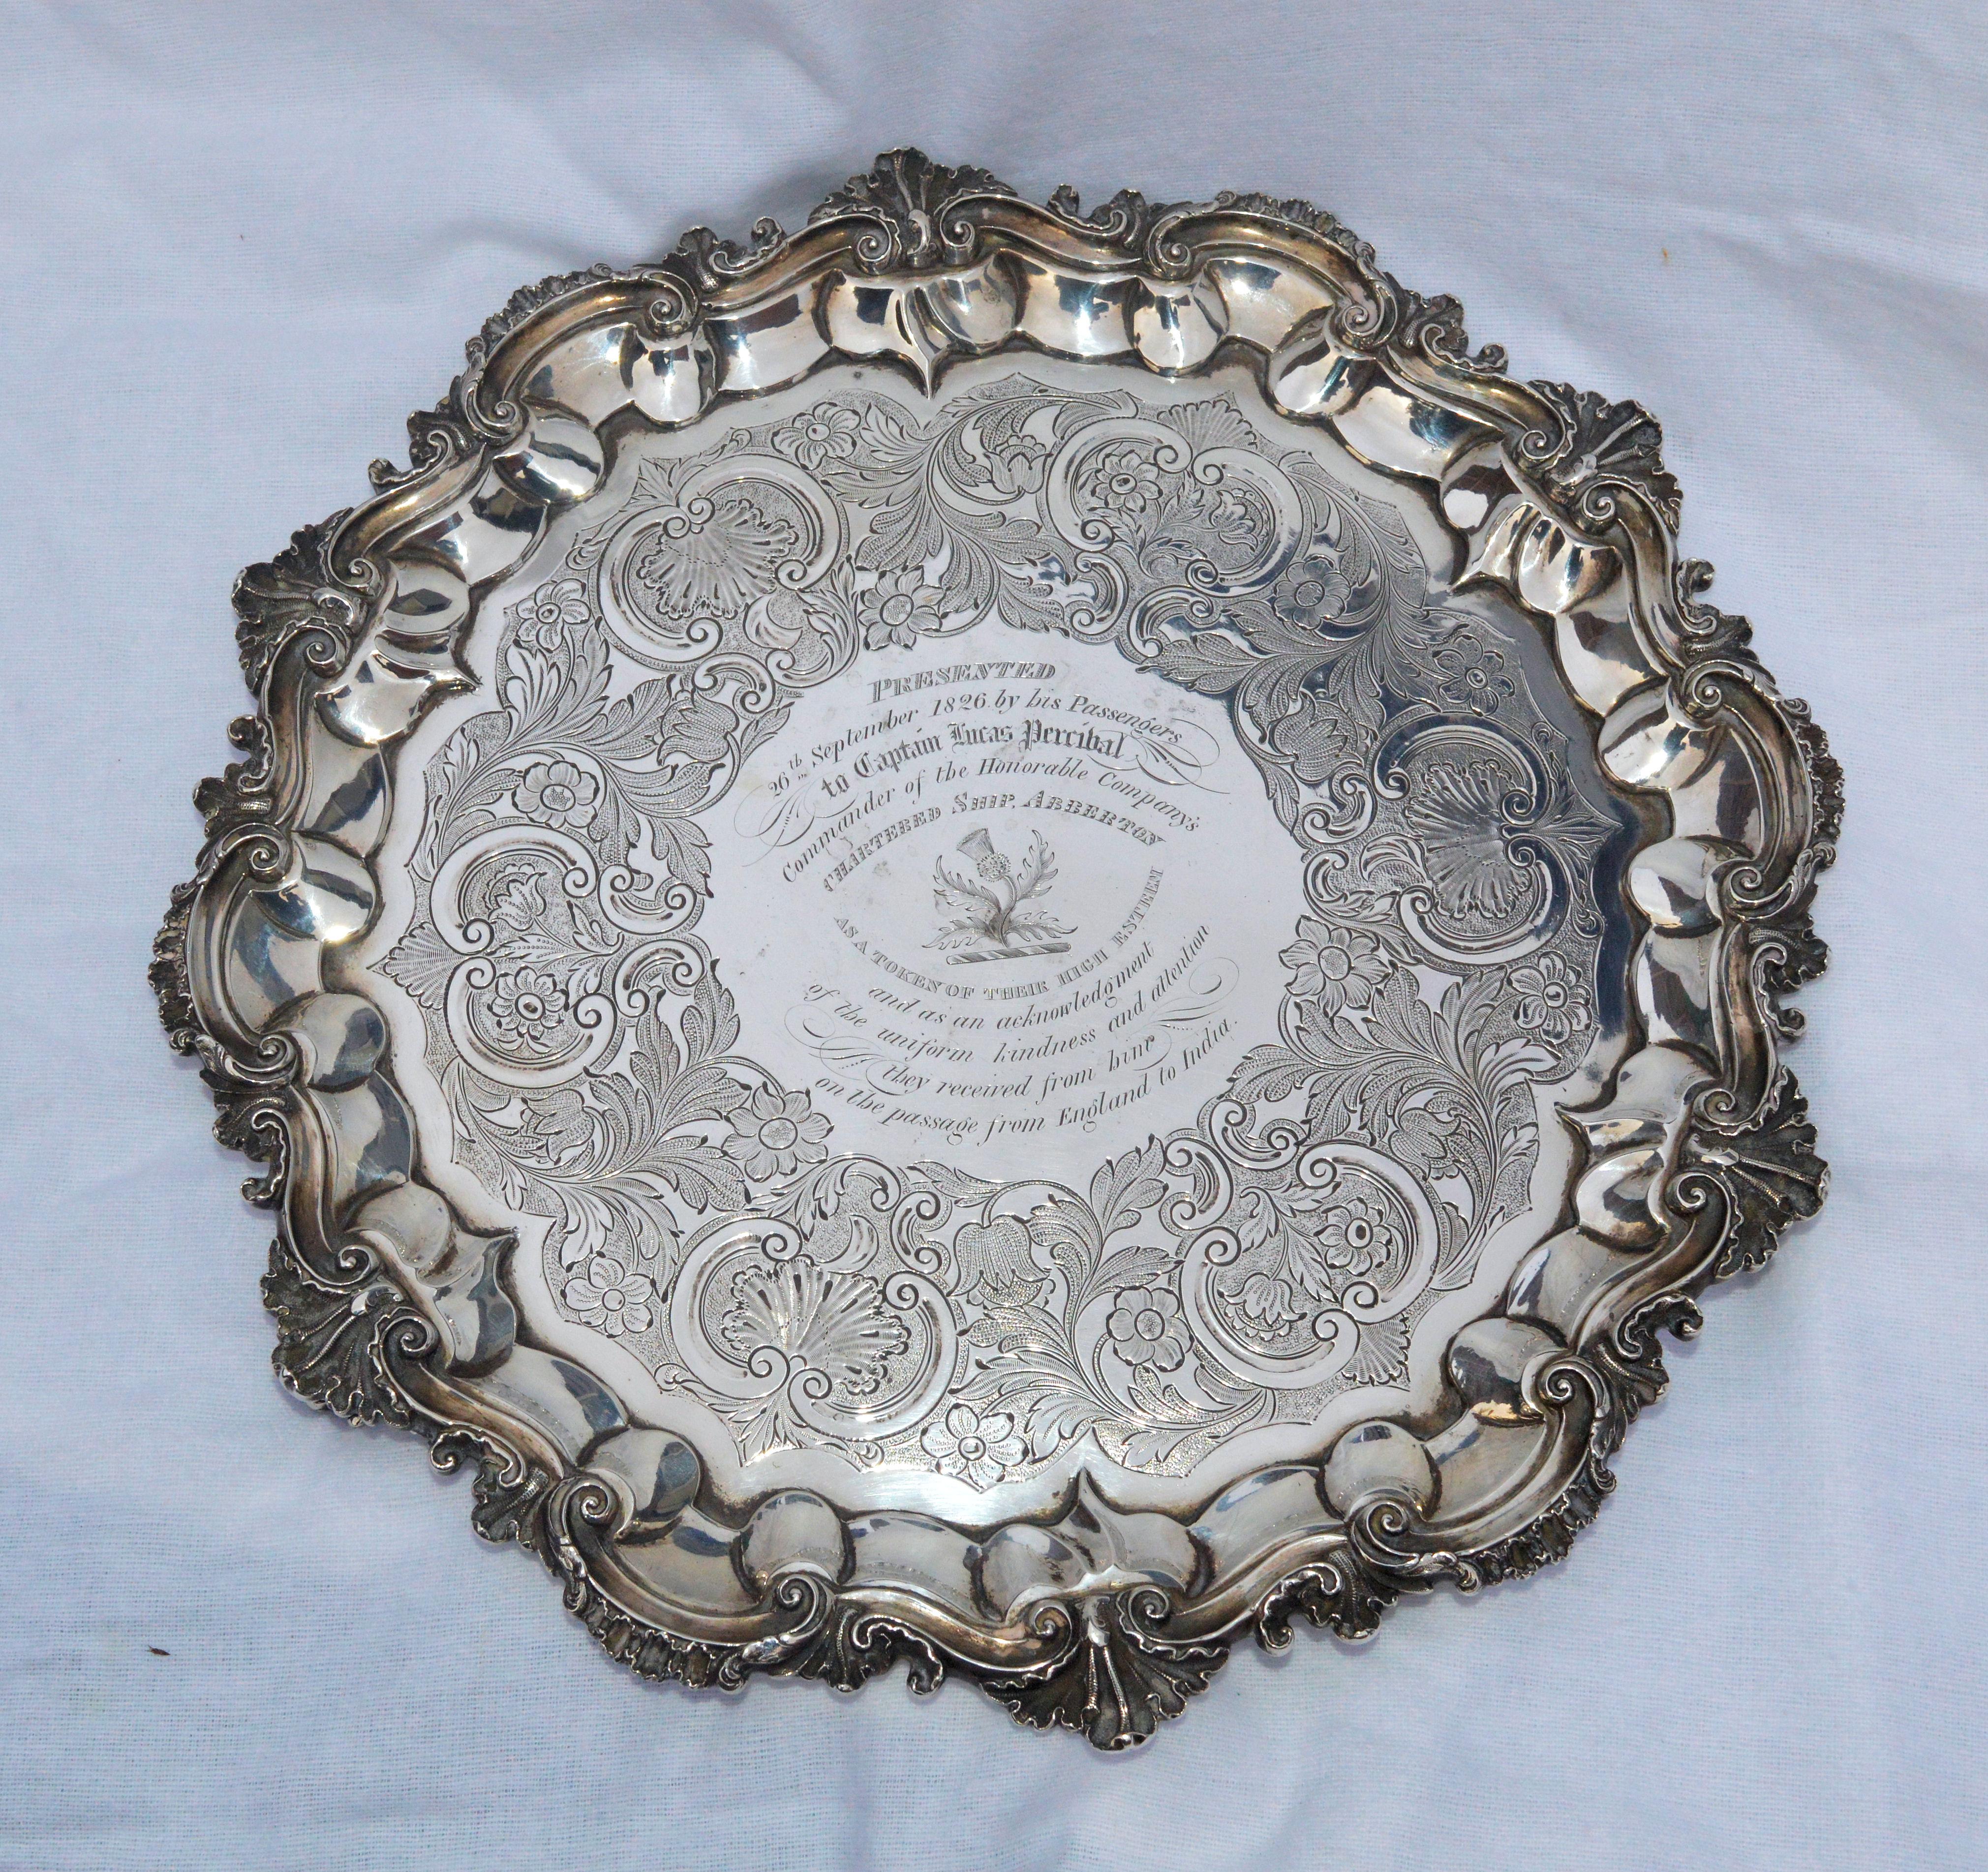 East India Company Presentation silver salver.